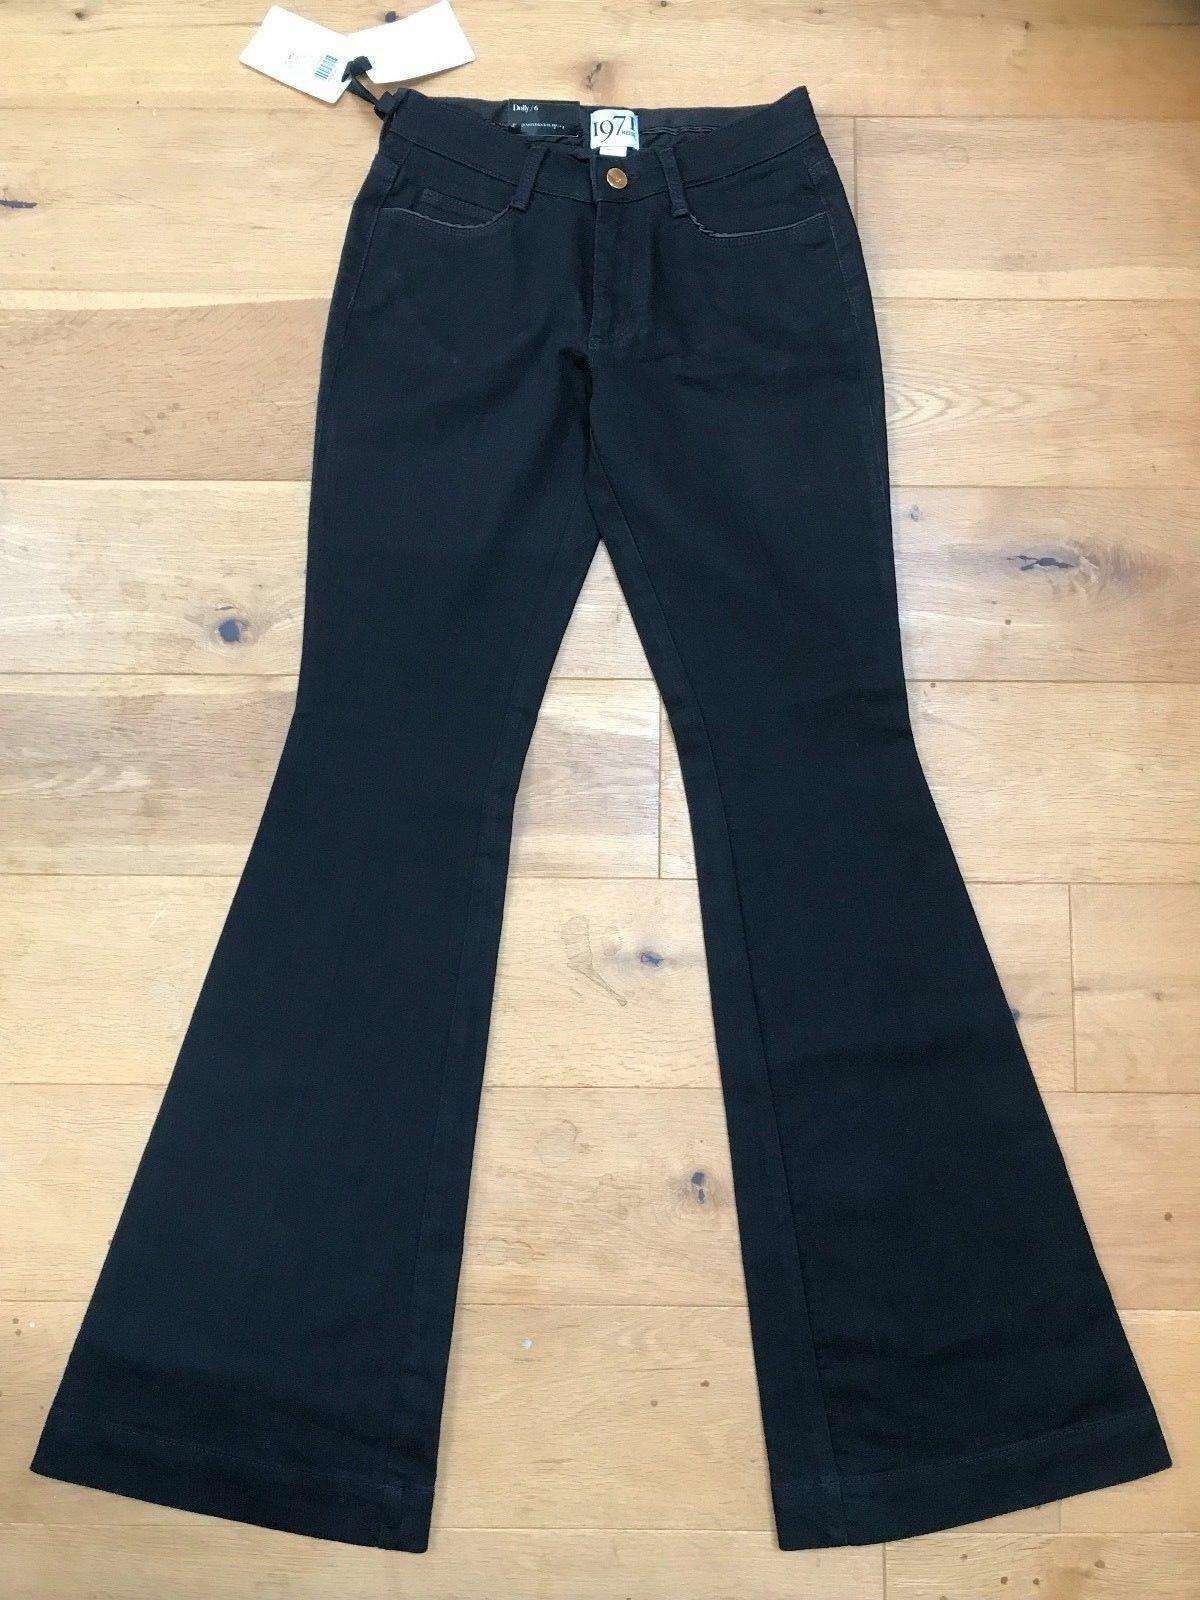 1971 Reiss Ladies schwarz Dolly Kick Flare Low Rise Stretch Jeans UK 4